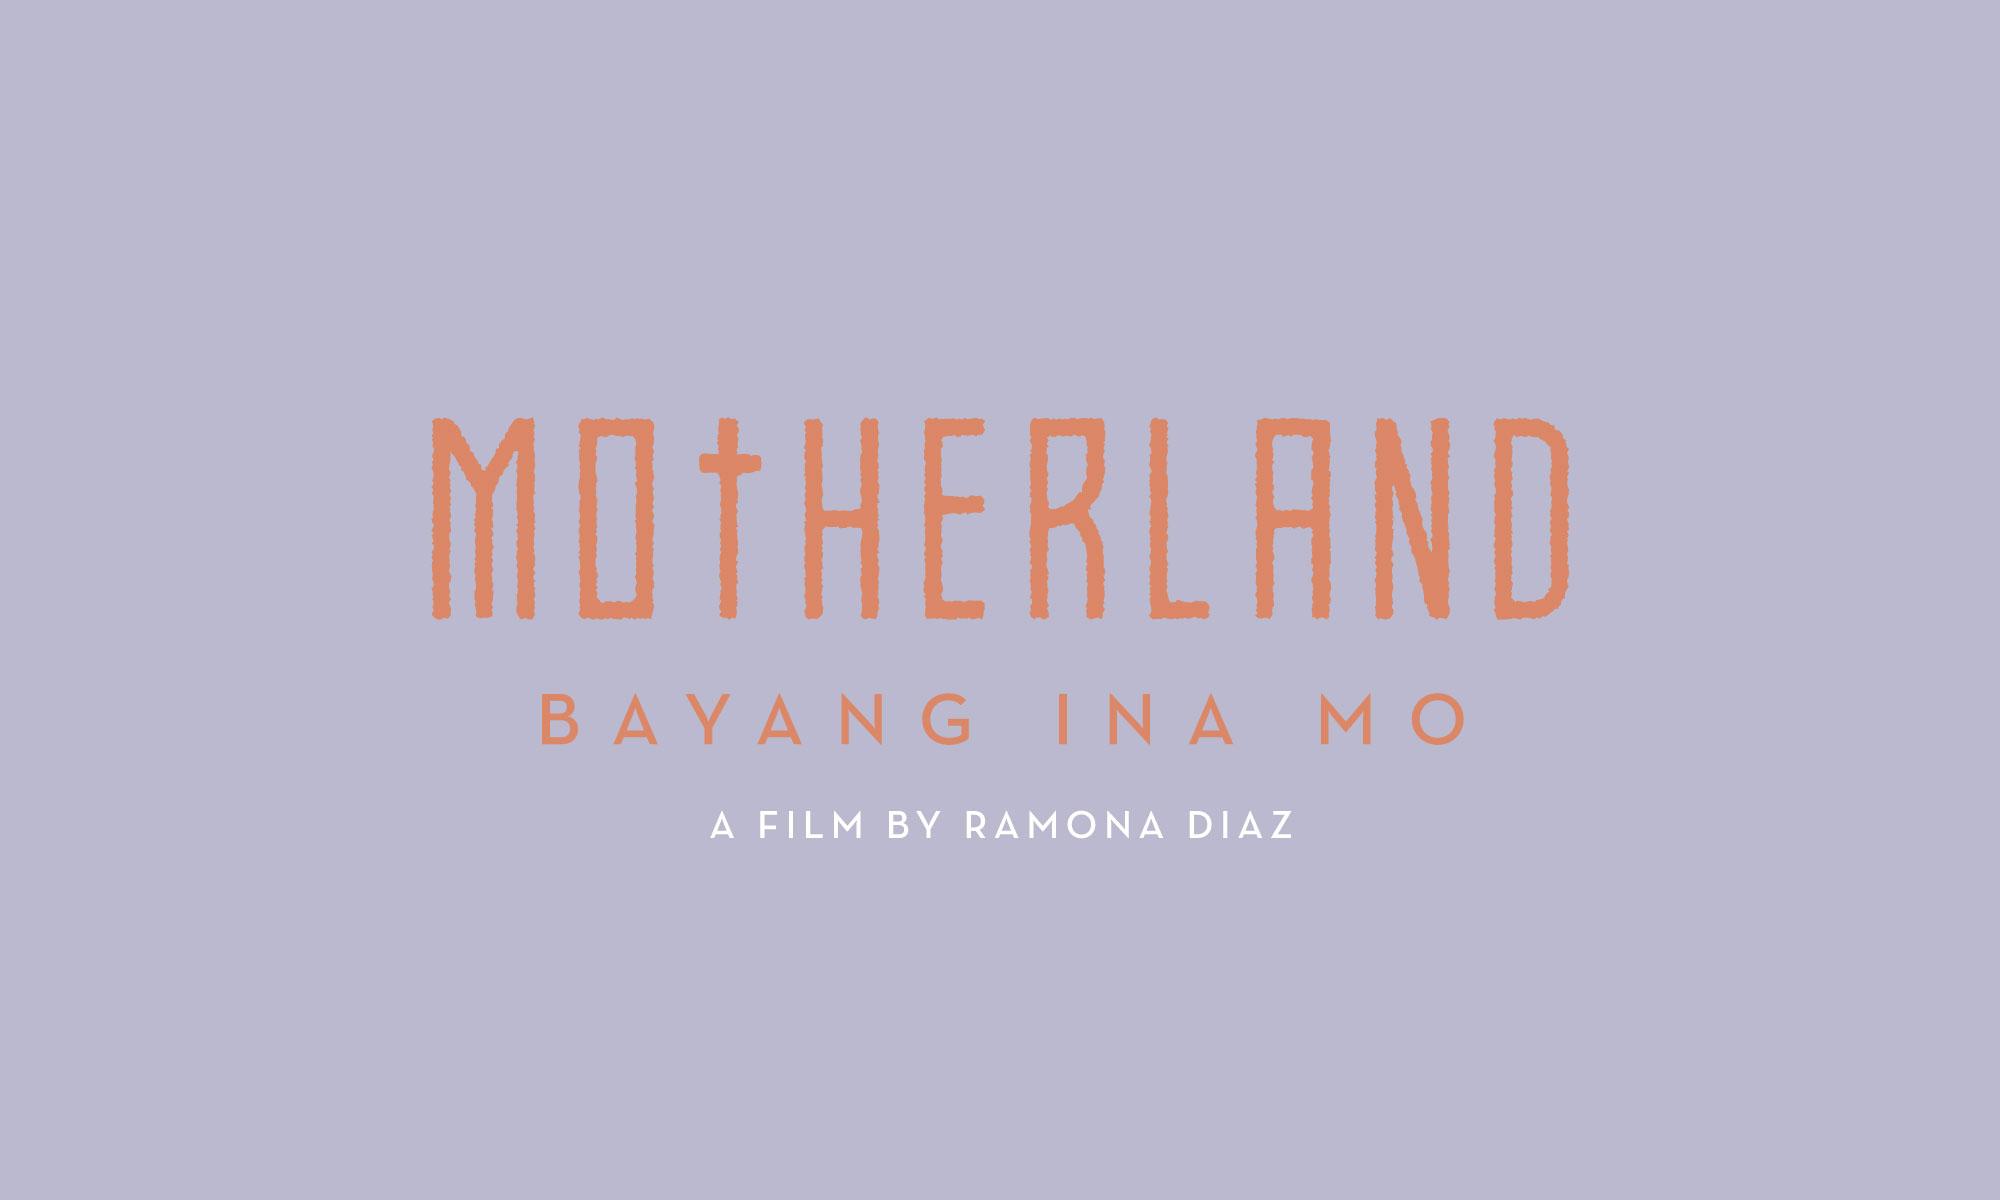 motherland_logo